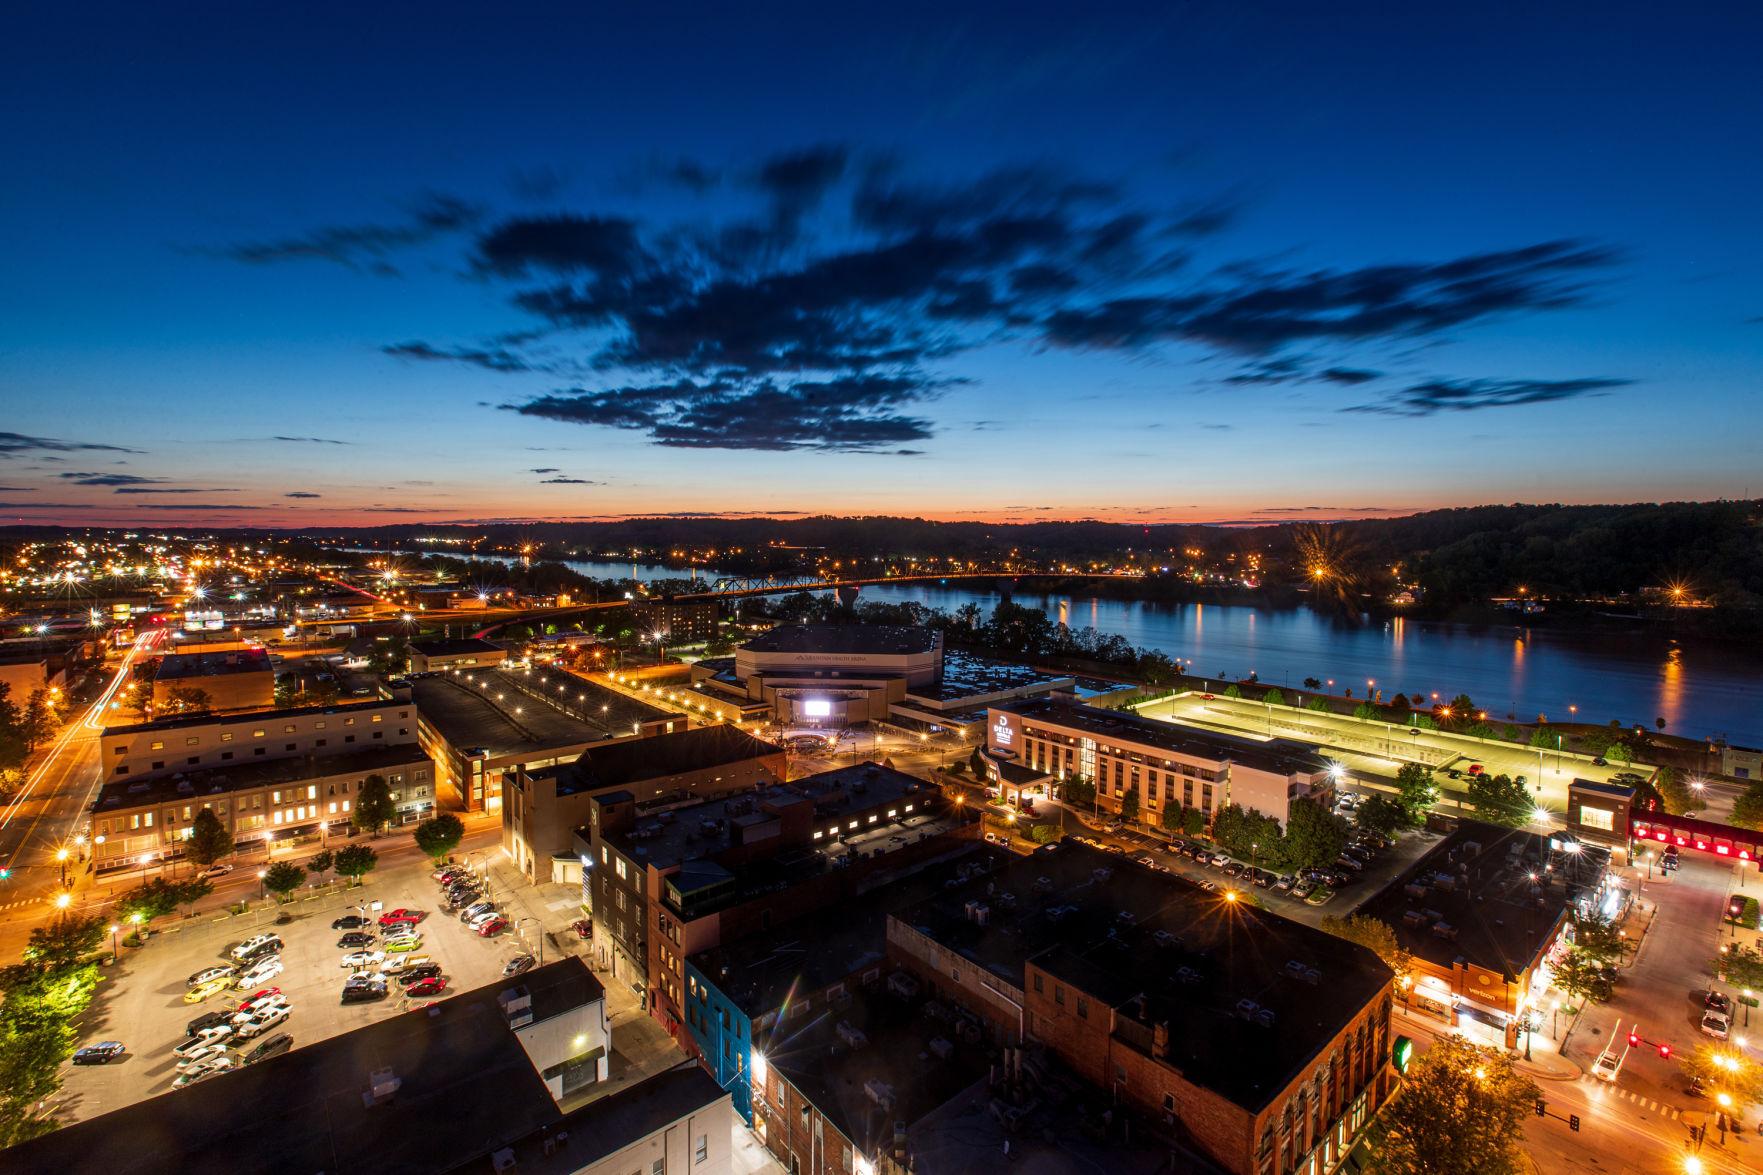 Downtown Huntington lights up at sunset